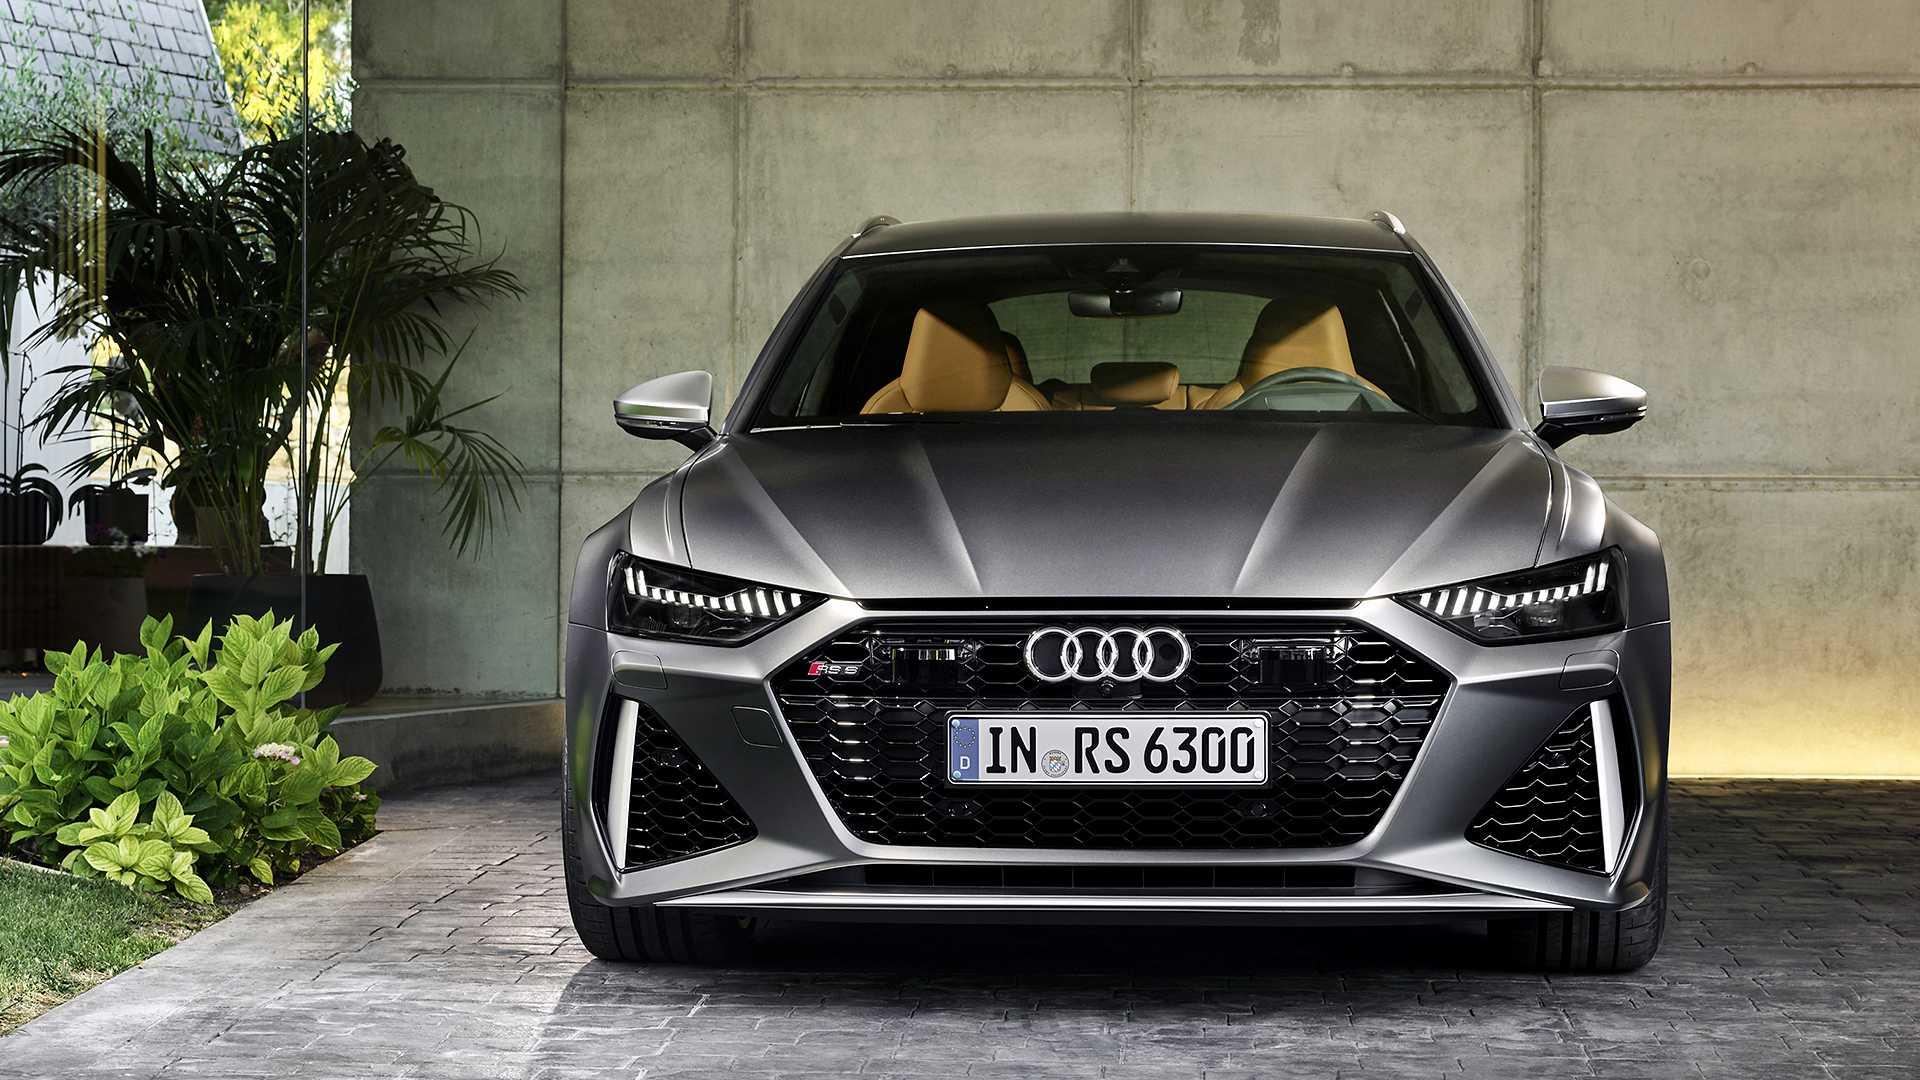 2020 Audi RS6 Avant   591-Horsepower Wagon Is Officially ...